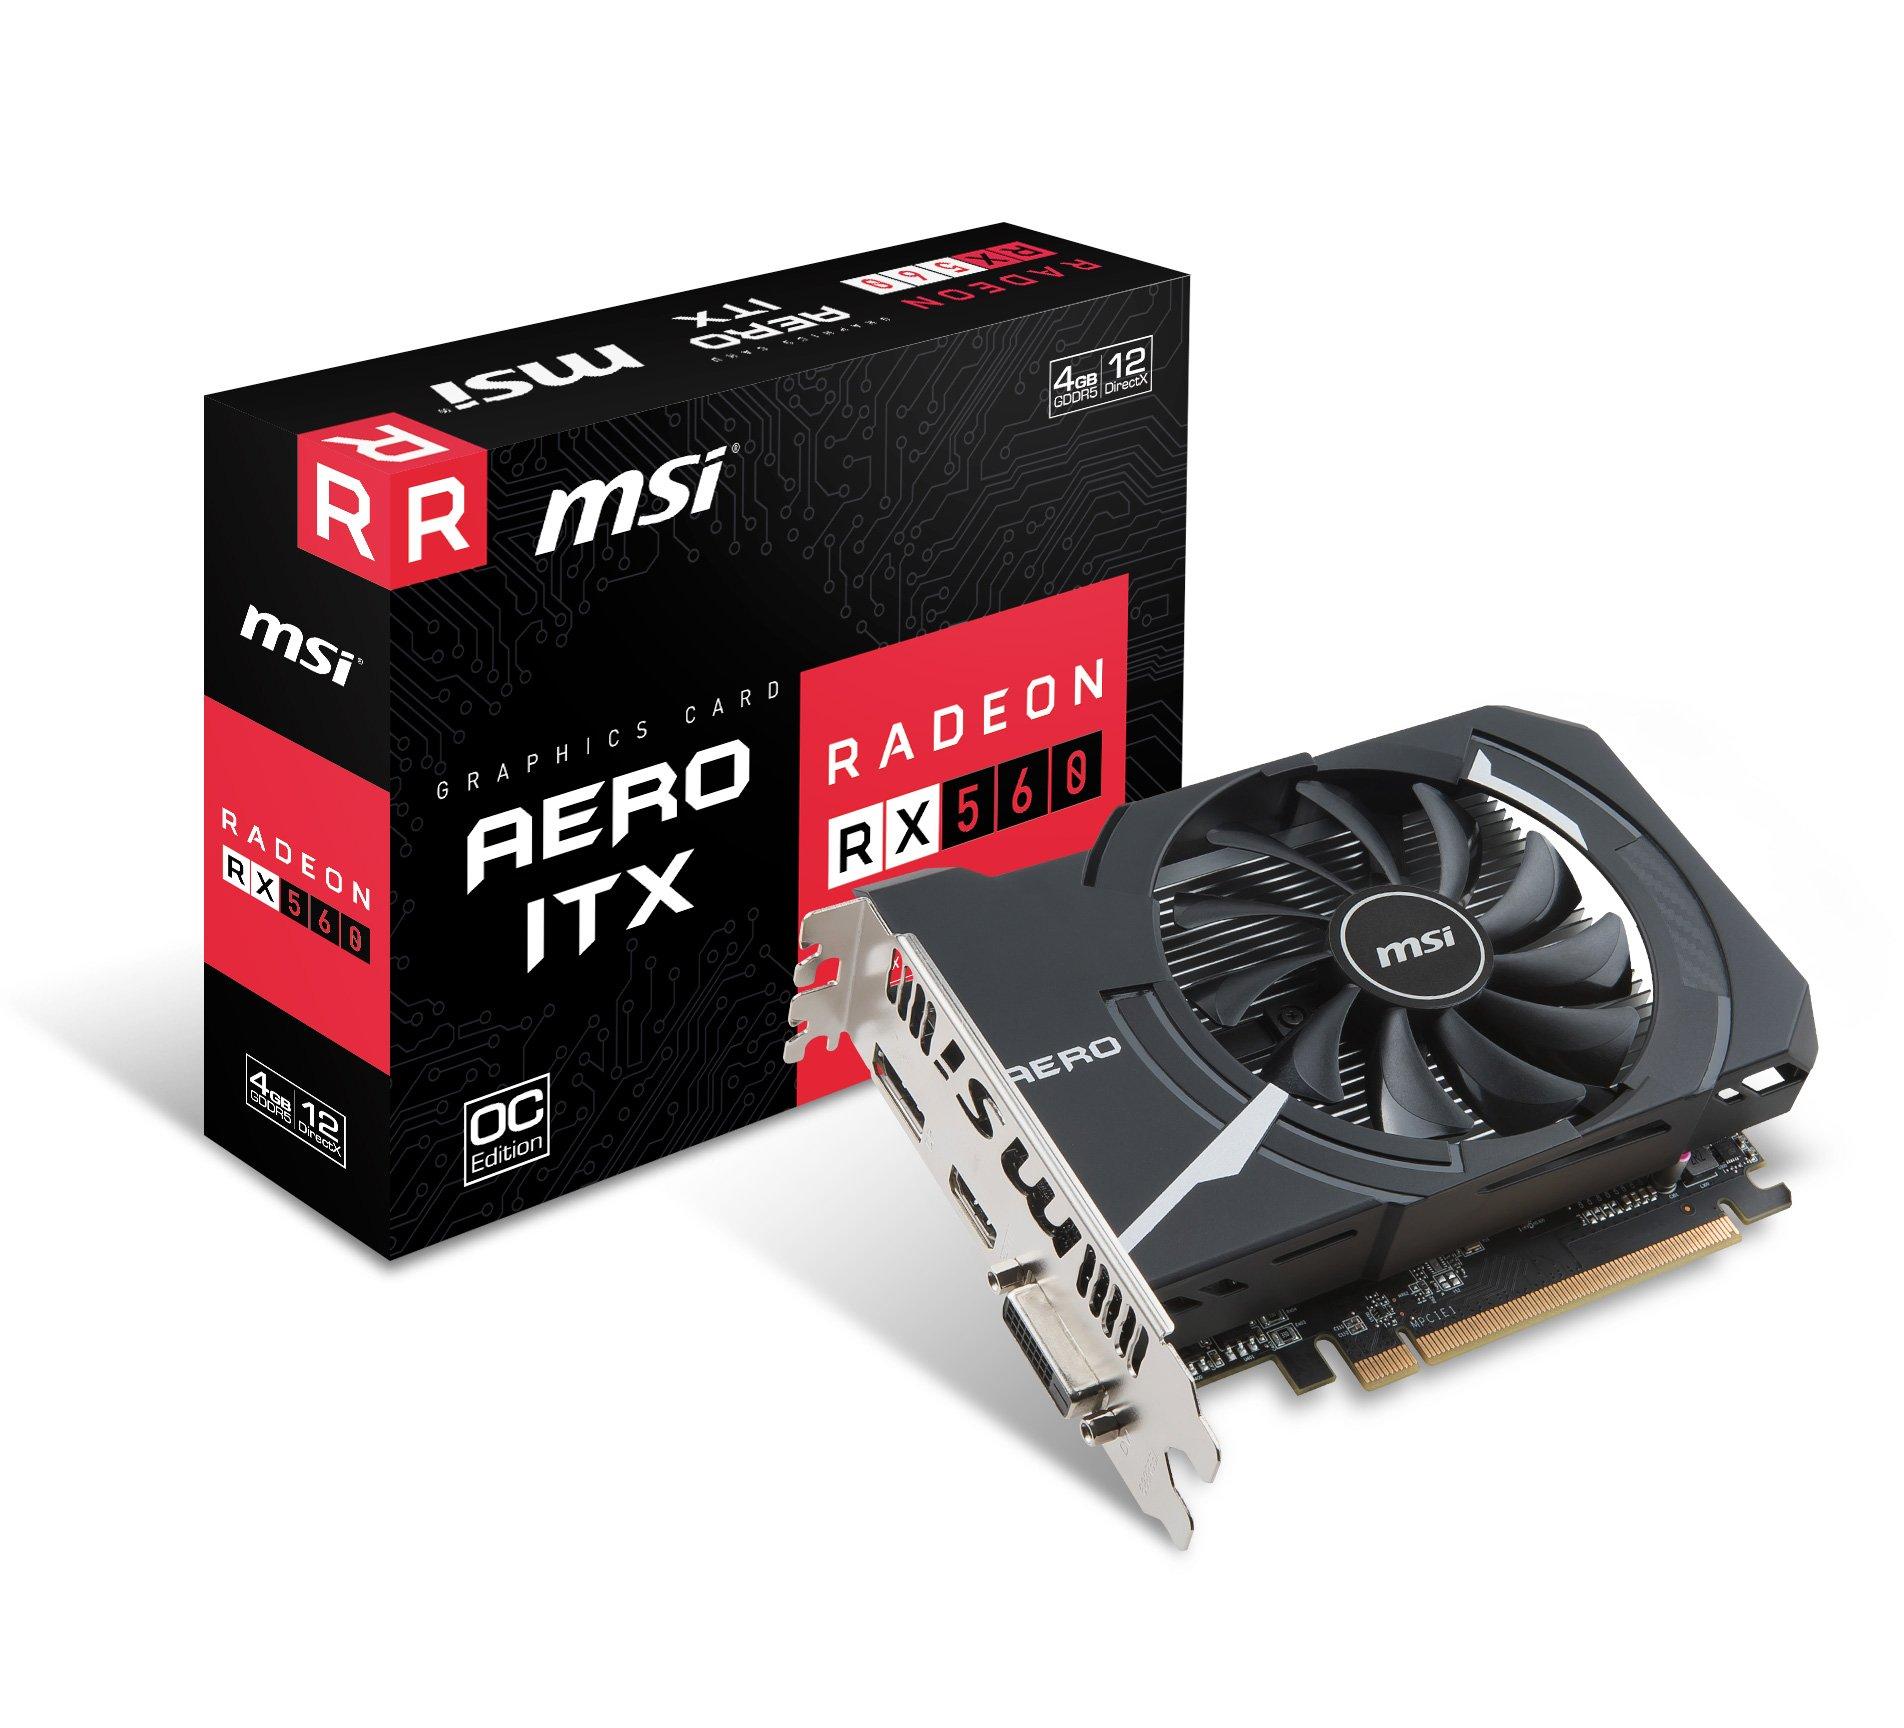 MSI Gaming Radeon RX 560 128-bit 4GB GDRR5 DirectX 12 VR Ready CFX Graphcis Card (RX 560 AERO ITX 4G OC)